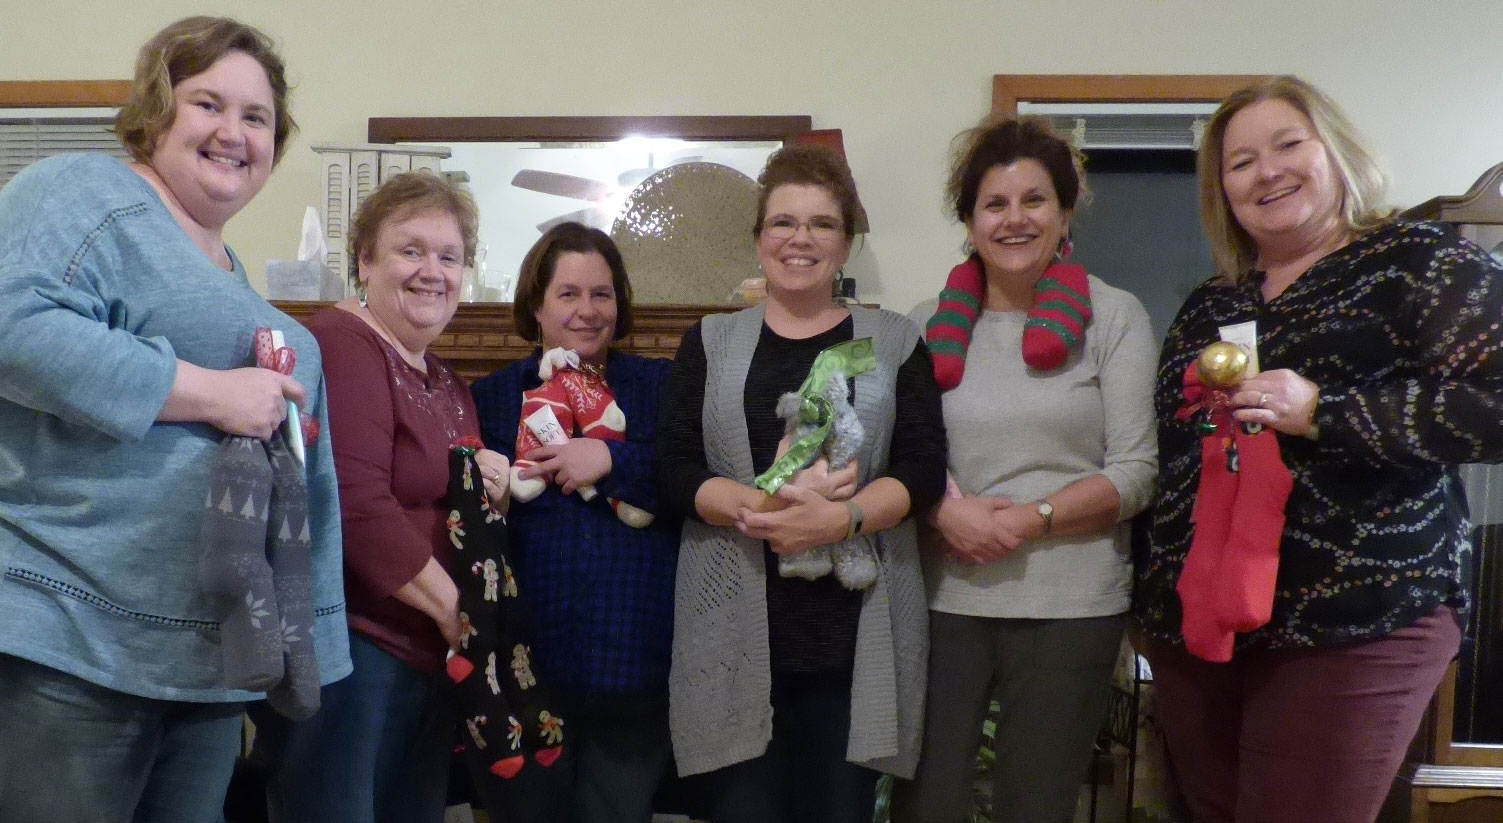 Small group Christmas stocking exchange :)